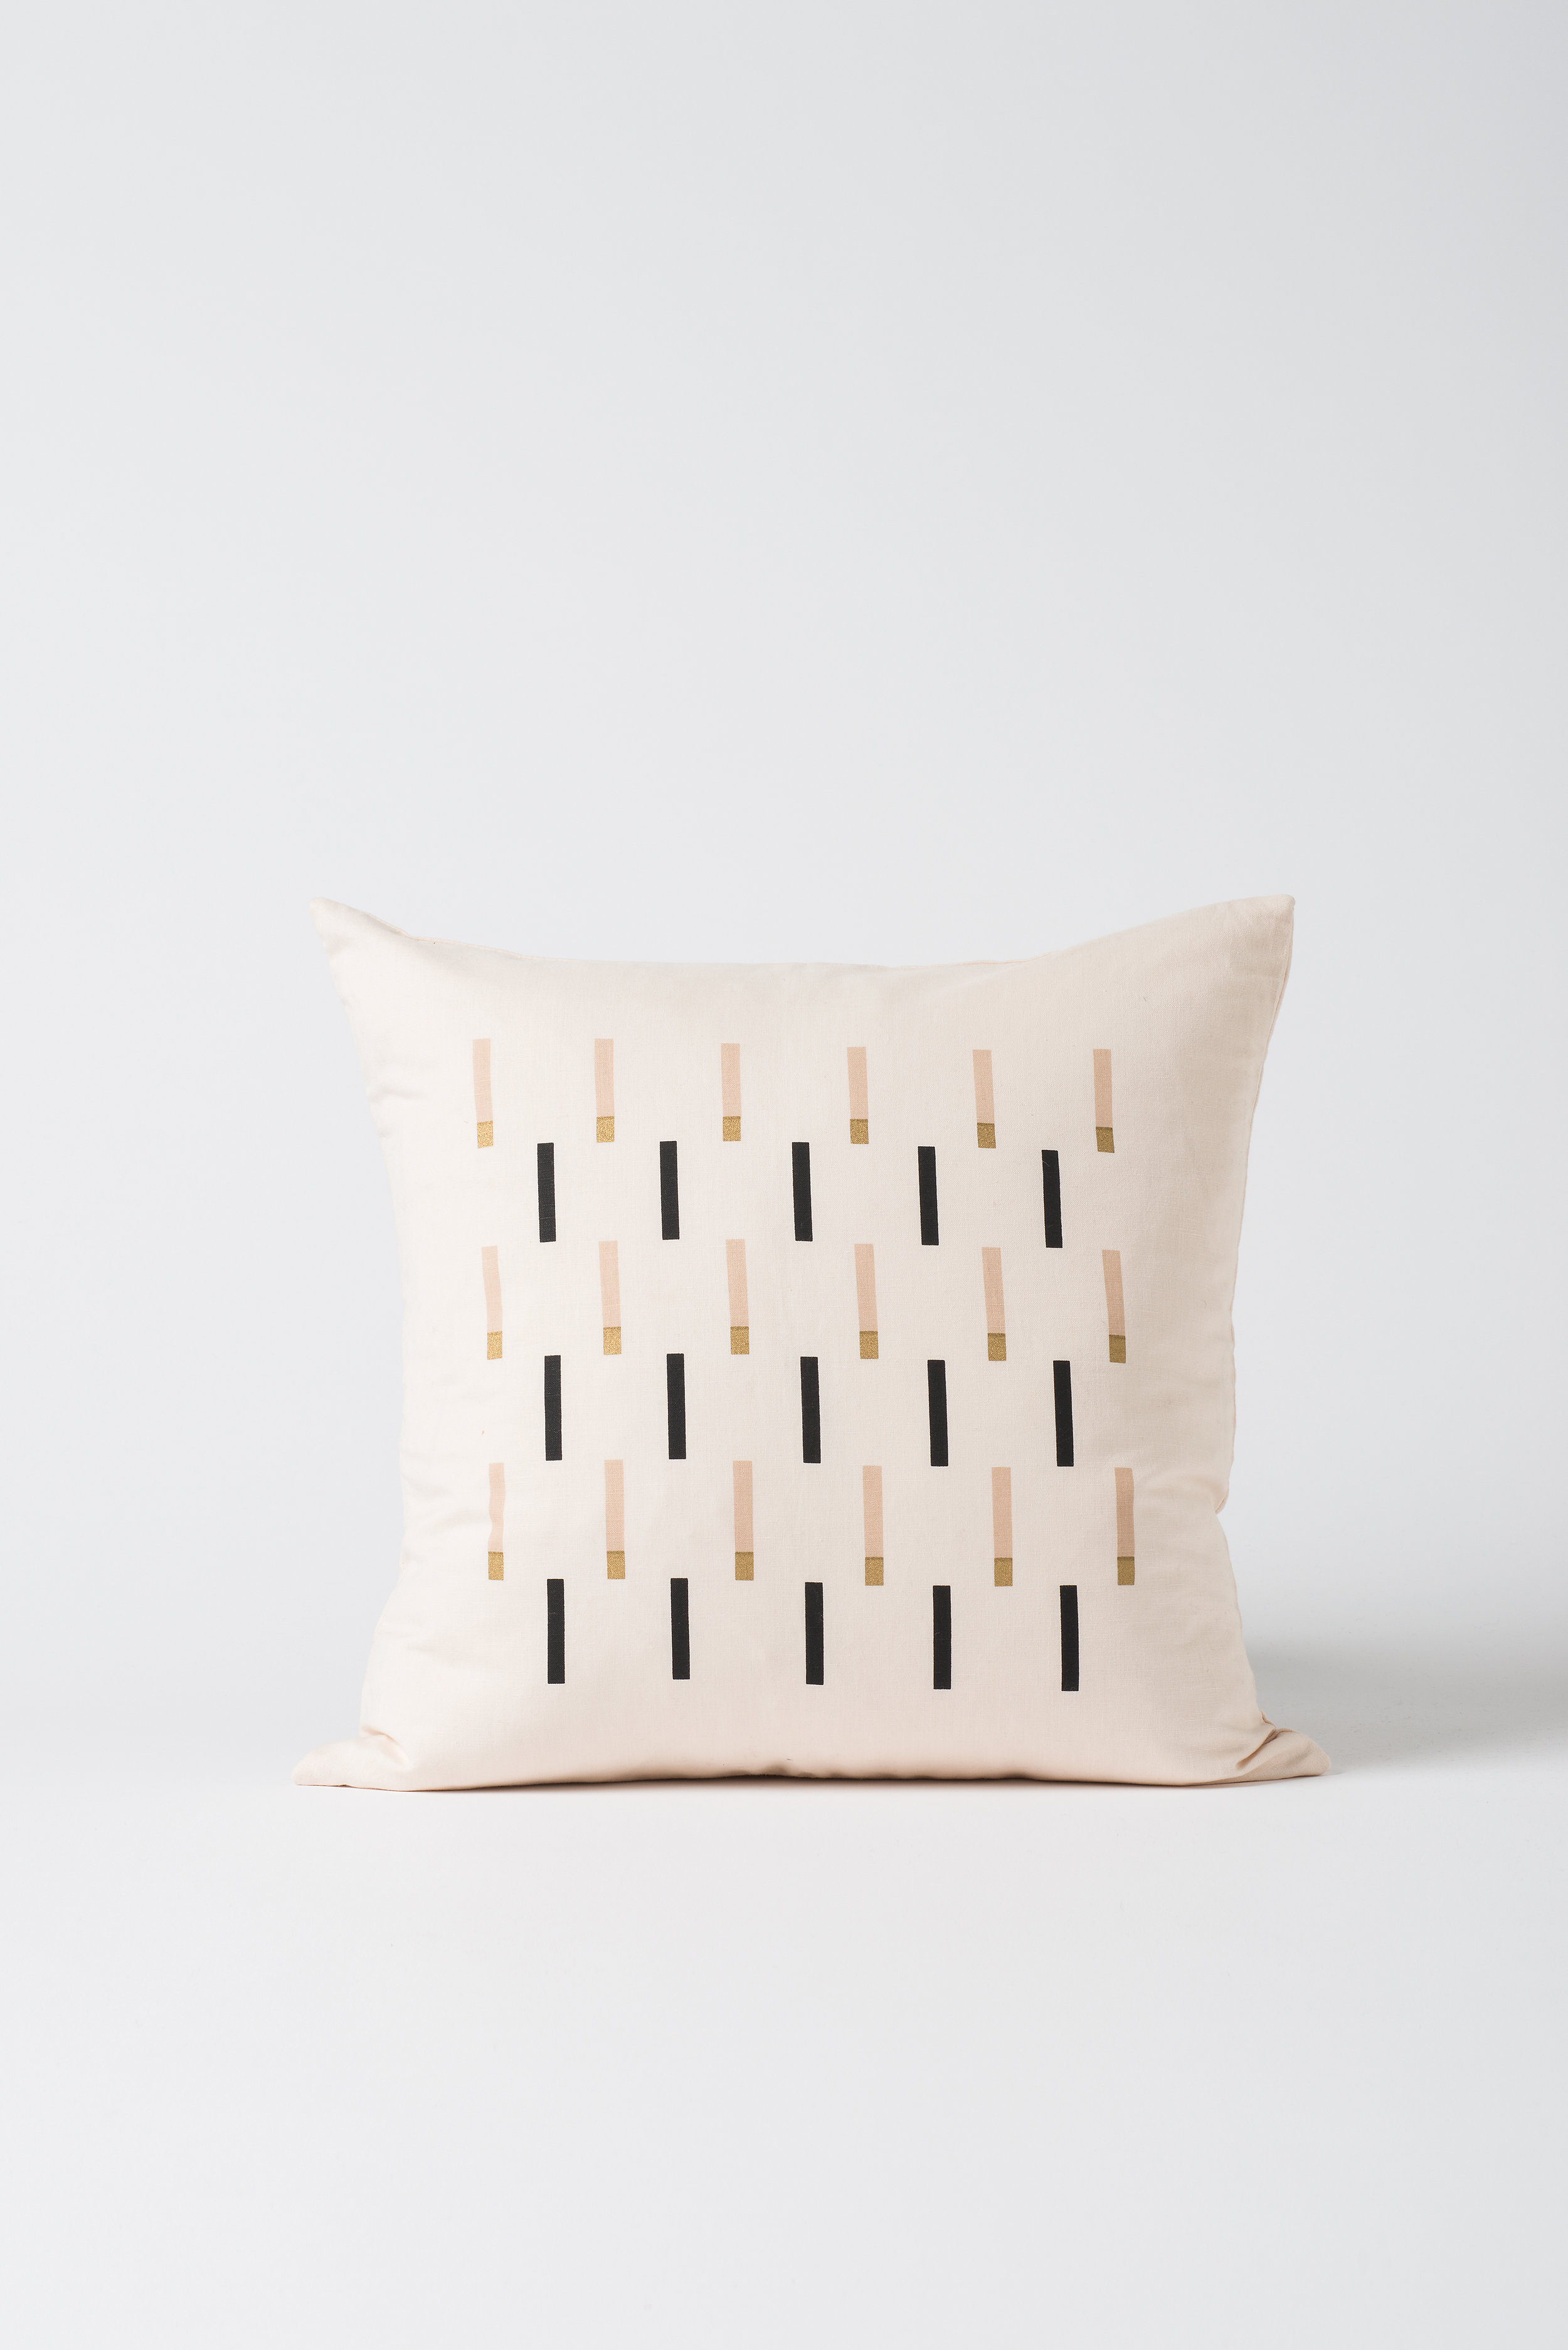 Match Cushion Cover $49.90